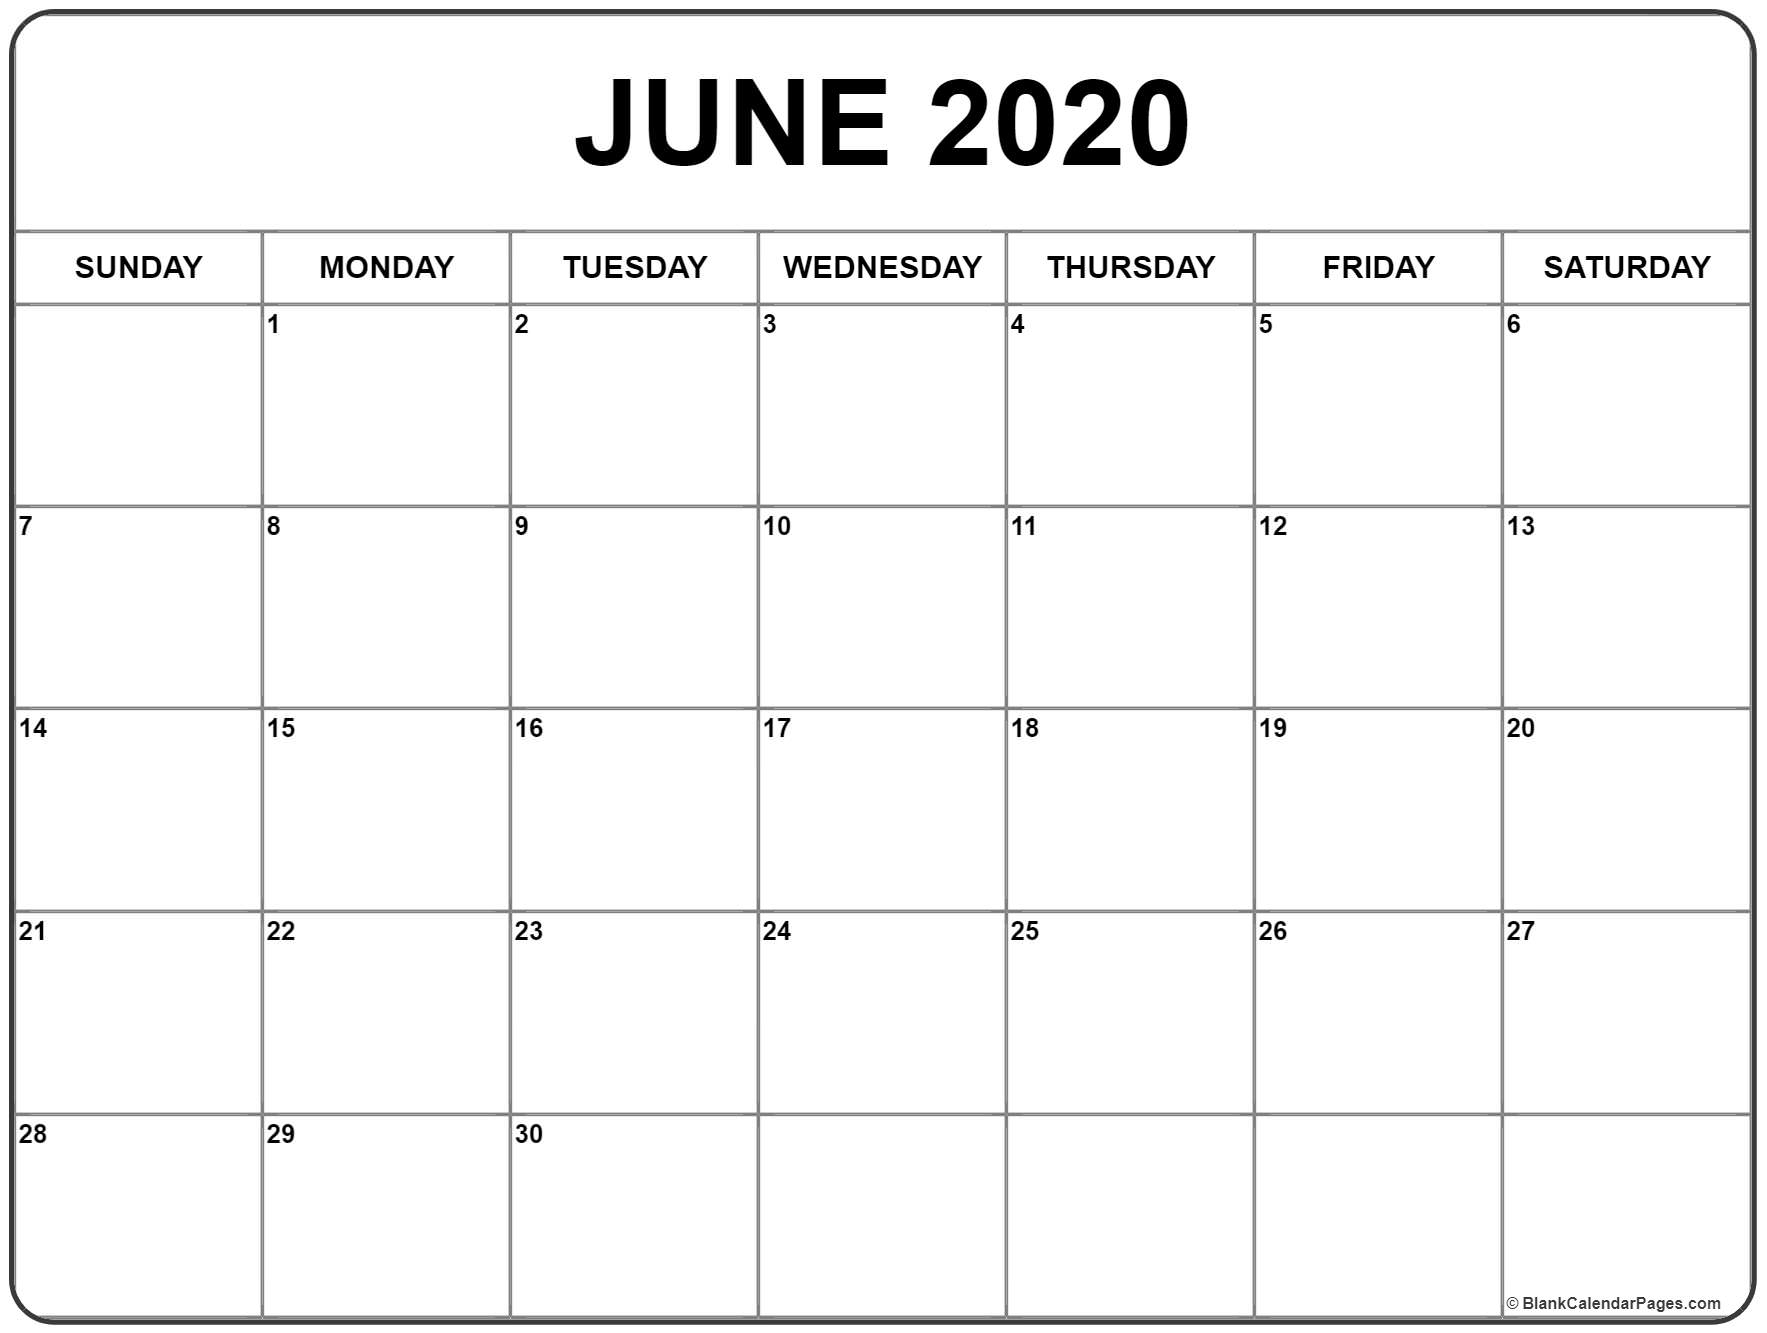 June 2020 Calendar | Free Printable Monthly Calendars for Free Printed Calendars From June 2019 To June 2020